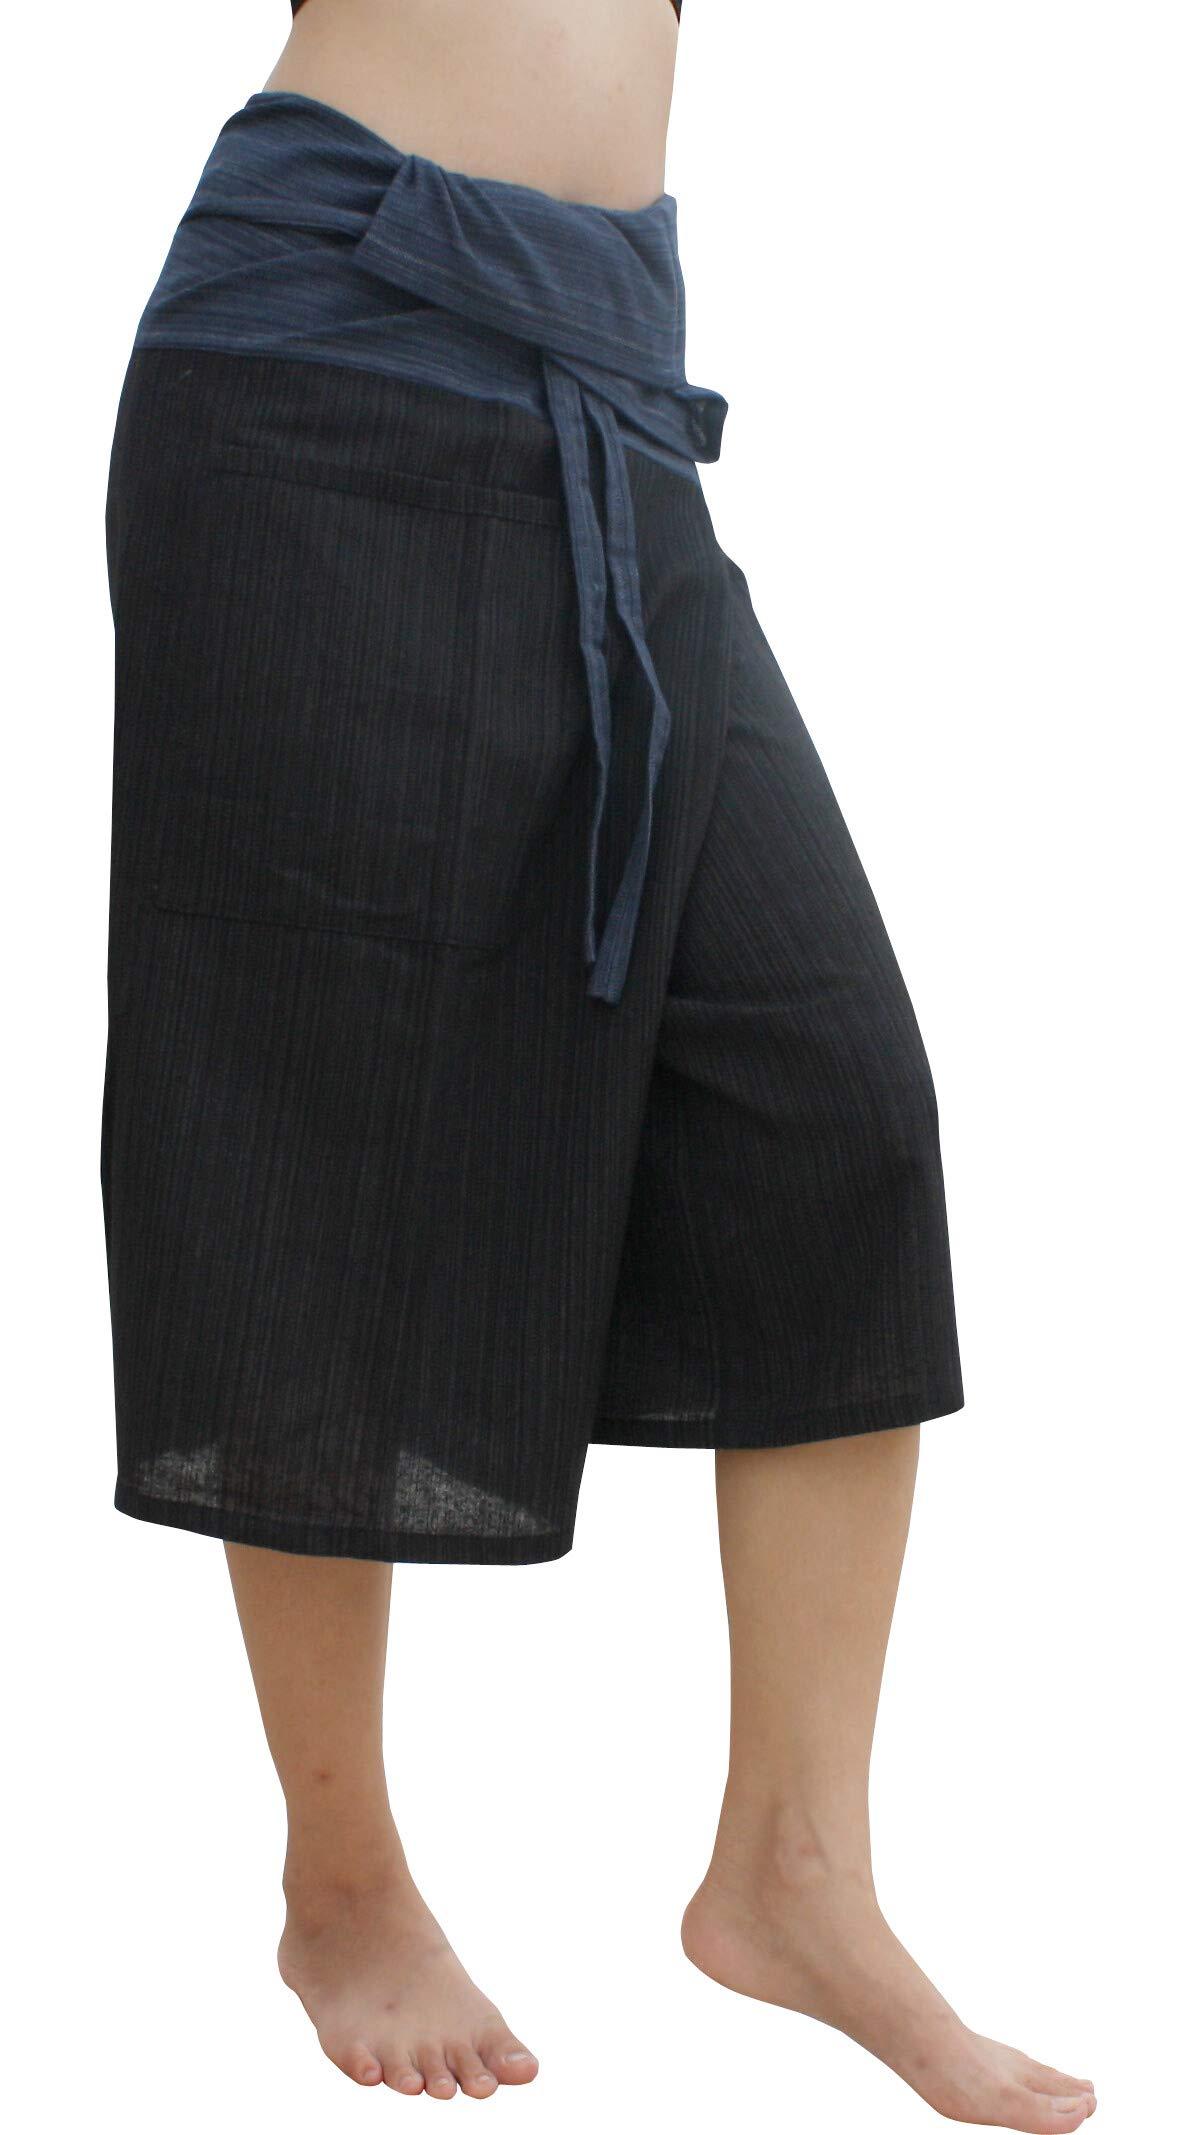 Raan Pah Muang Thin Striped Cotton Two Tone Fisherman Capri Wrap Plus Sized Pants, XX-Large, Black/Yale Blue by Raan Pah Muang